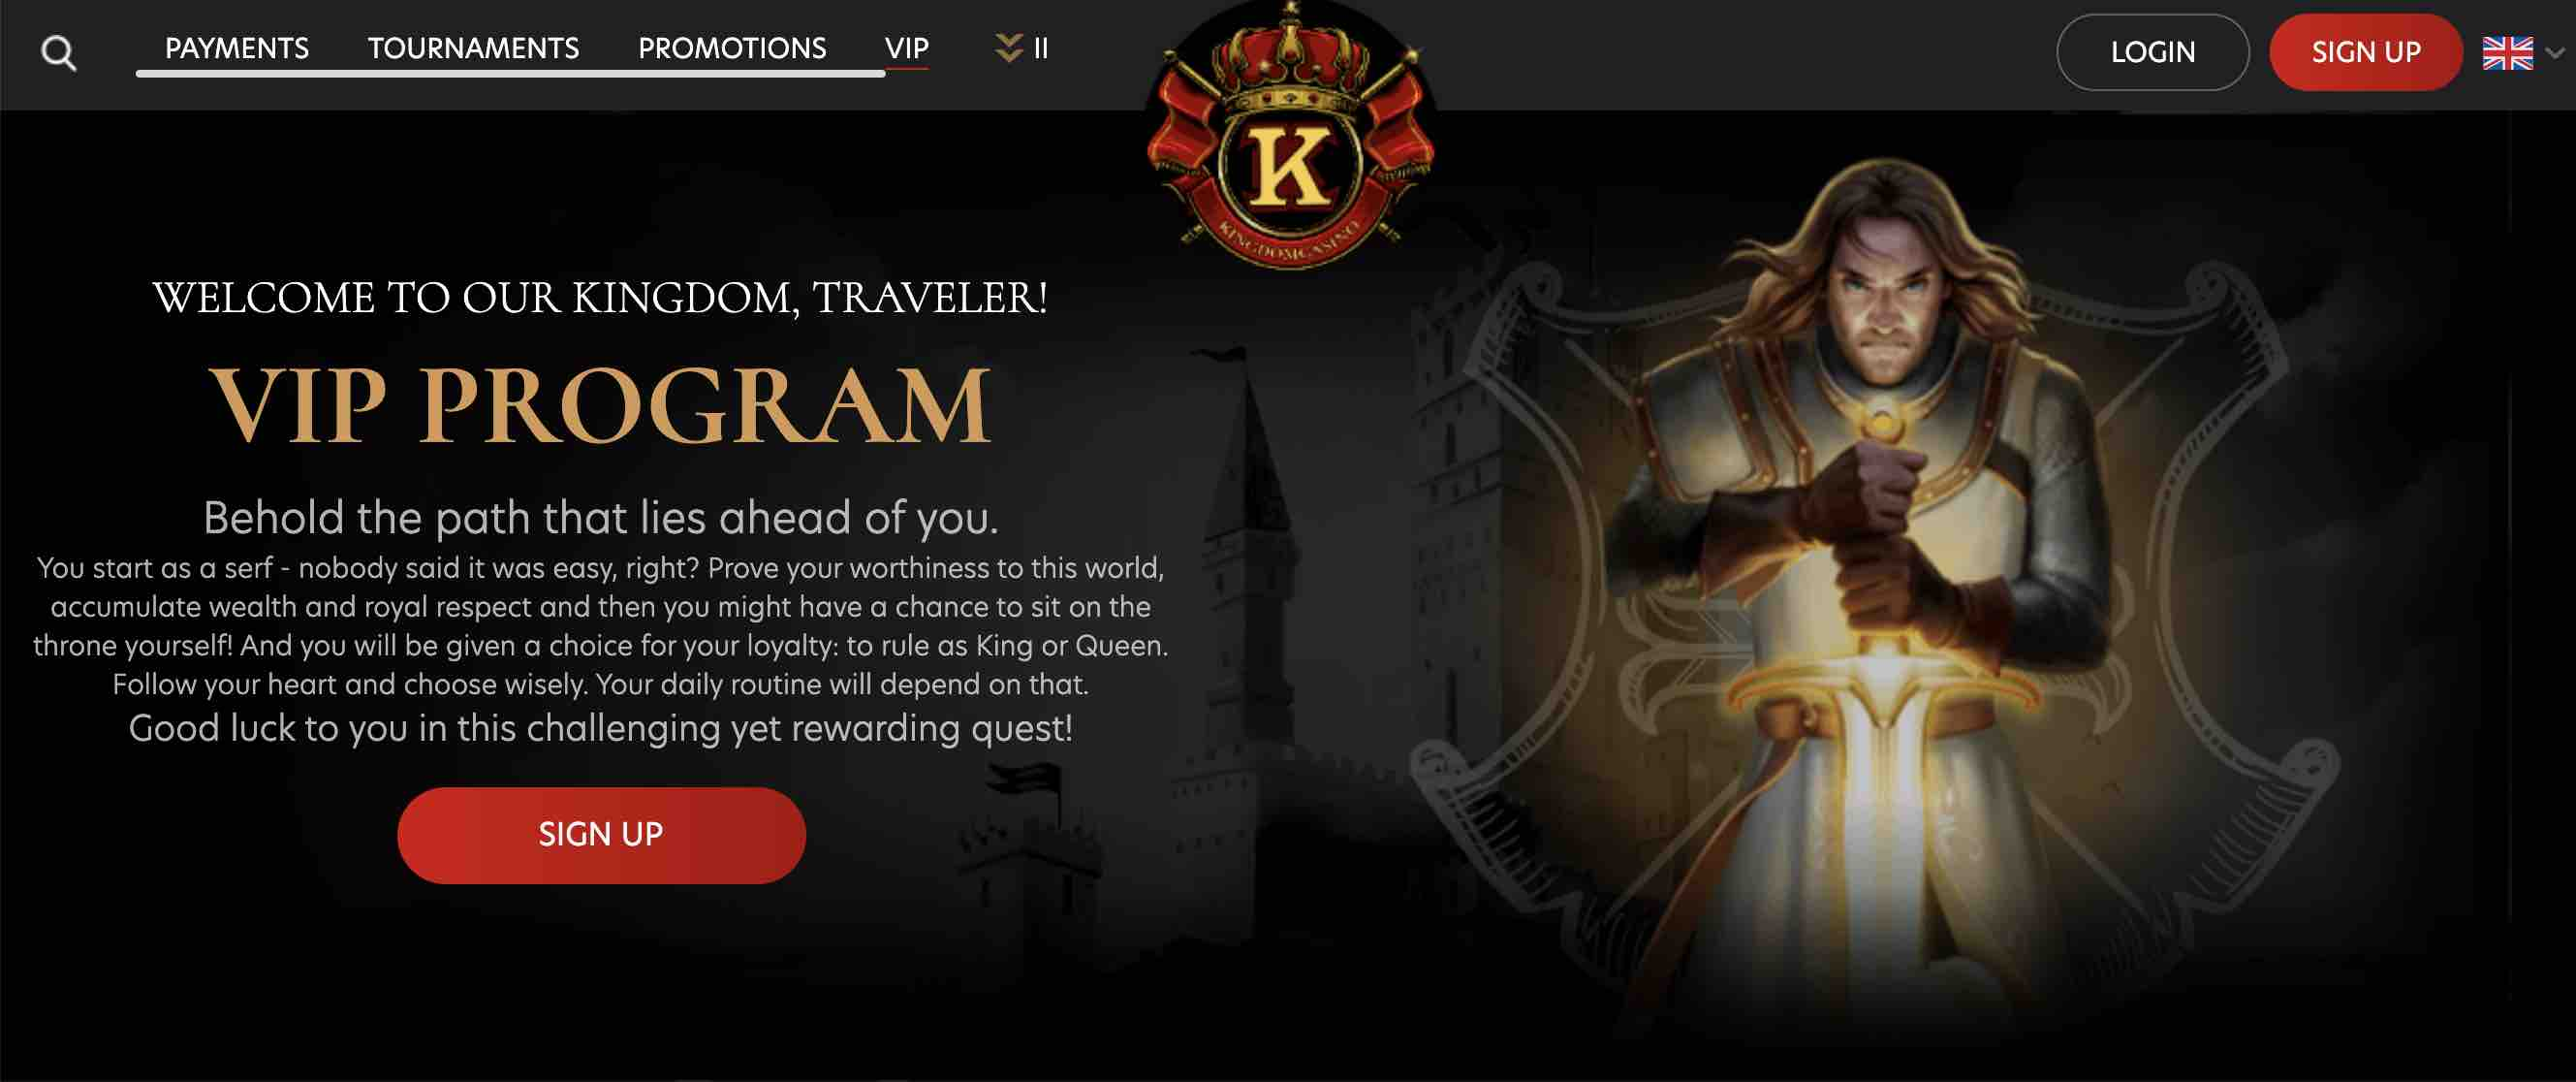 Kingdom Casino VIP Program